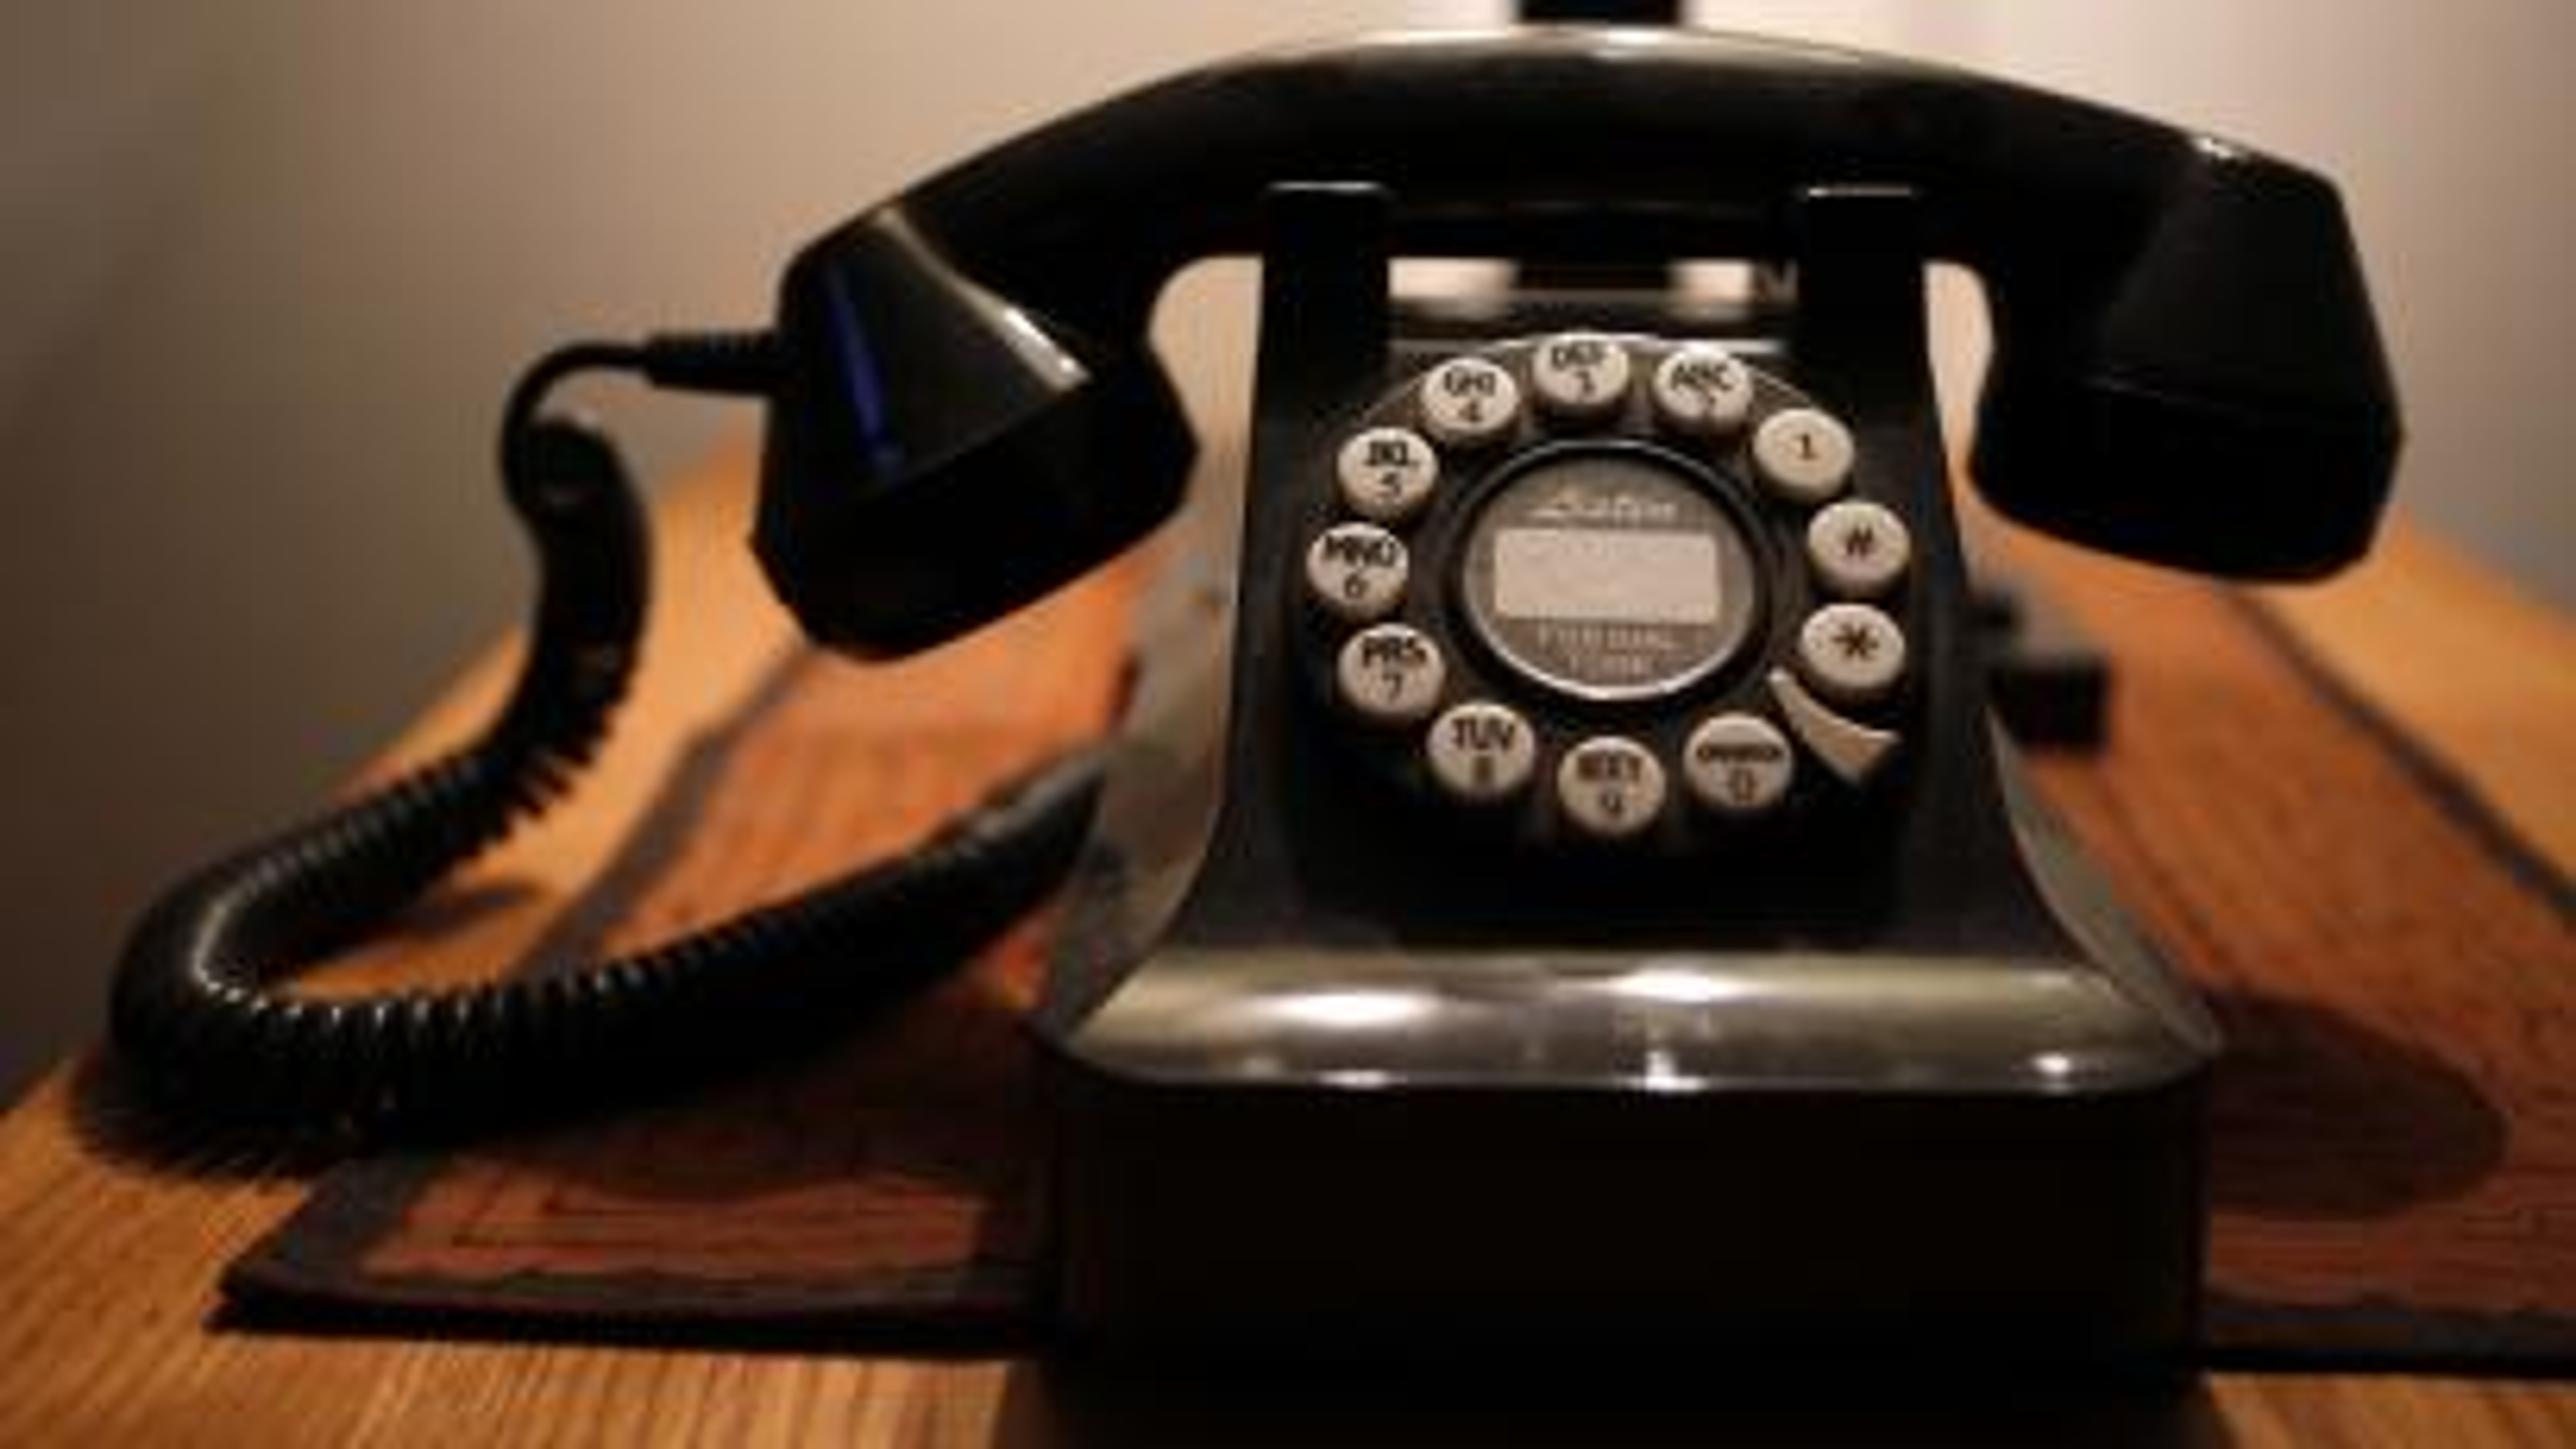 a push-button landline telephone